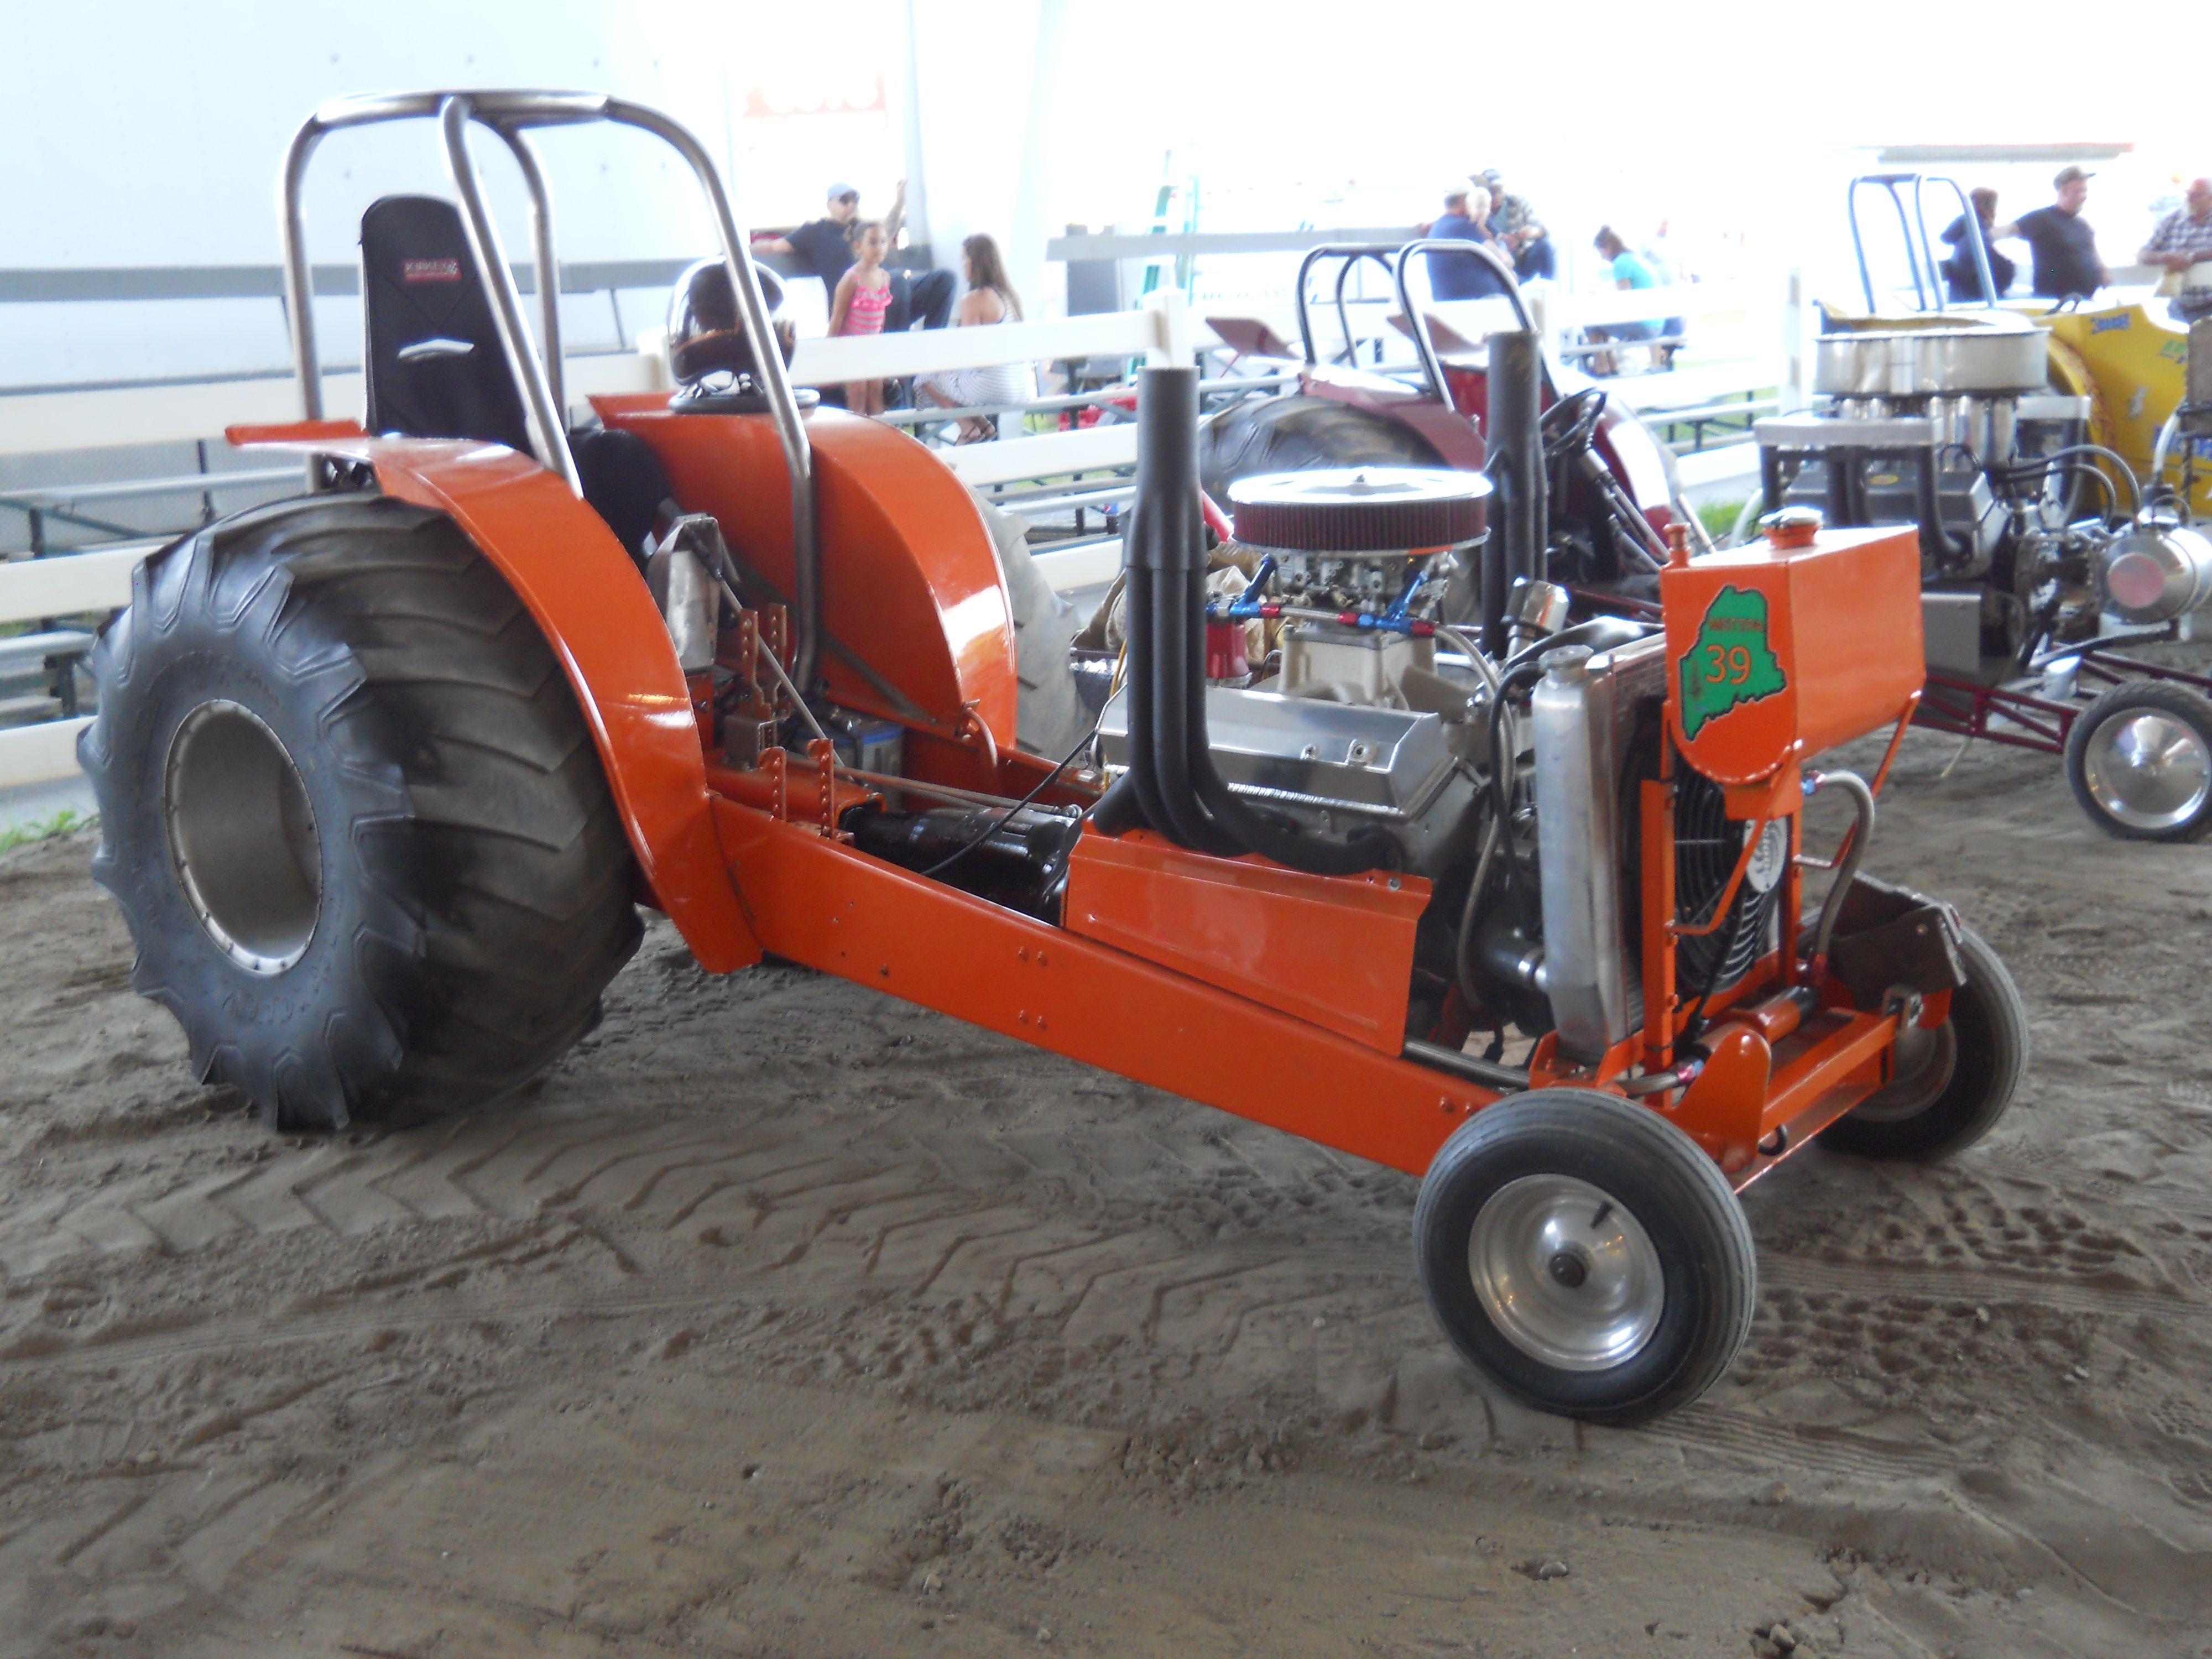 Mini Mod Tractor Pulling : Pin by doris quot viewwithme beaulieu on racers mini mod